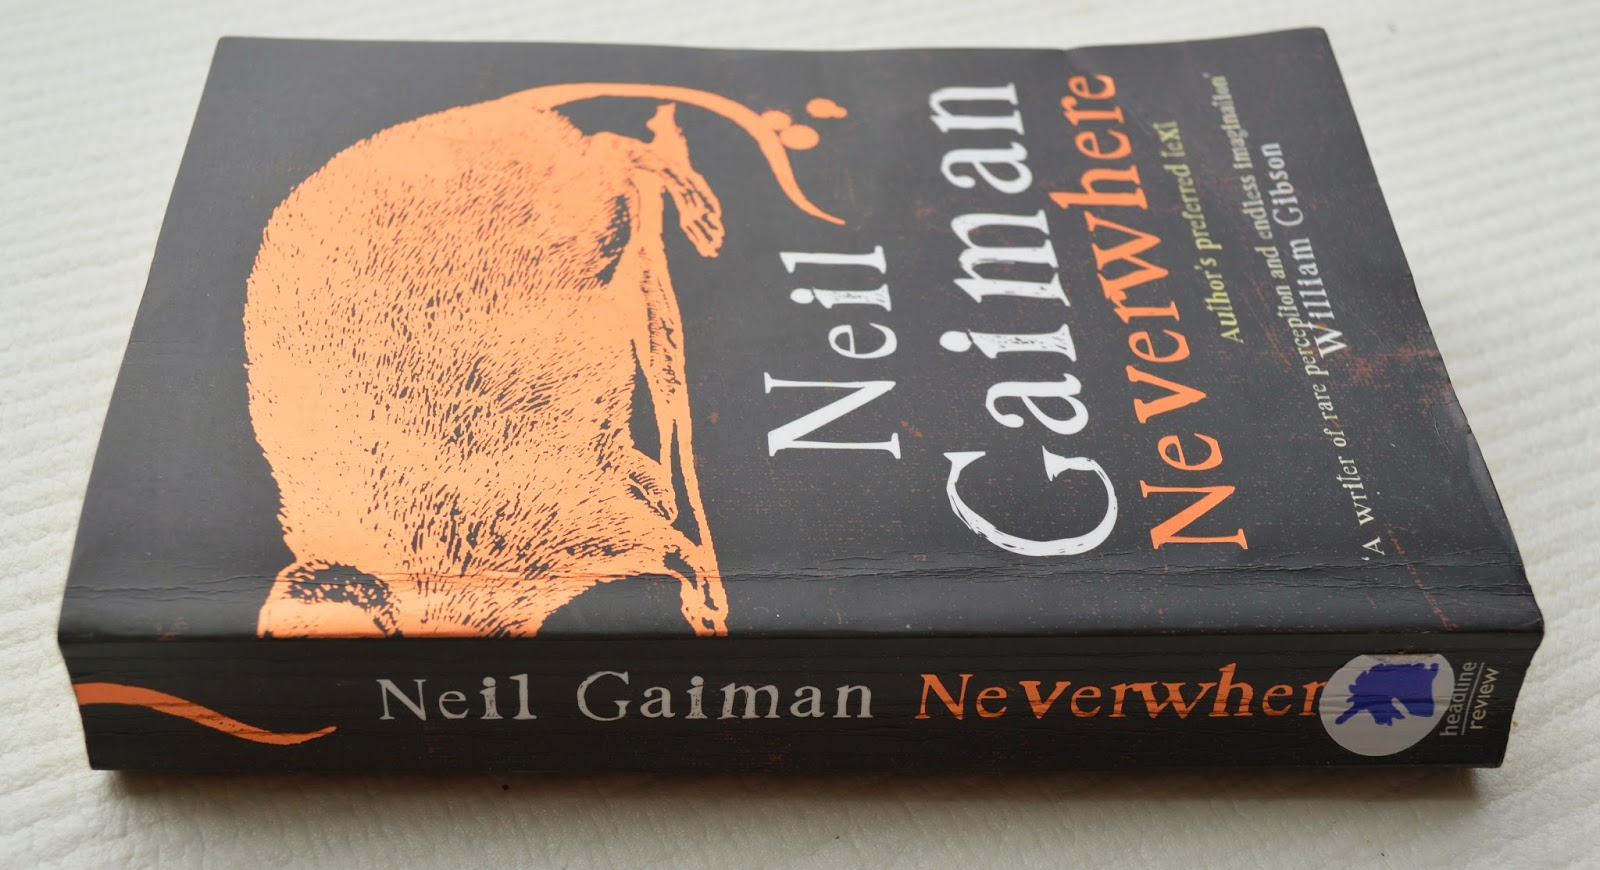 London, LondonBelow, Neil Gaiman, Neverwhere, review, paperback, UK edition, book cover, fantasy, magic, Door, Richard, floating market, fiction, tube station, Angel Islington